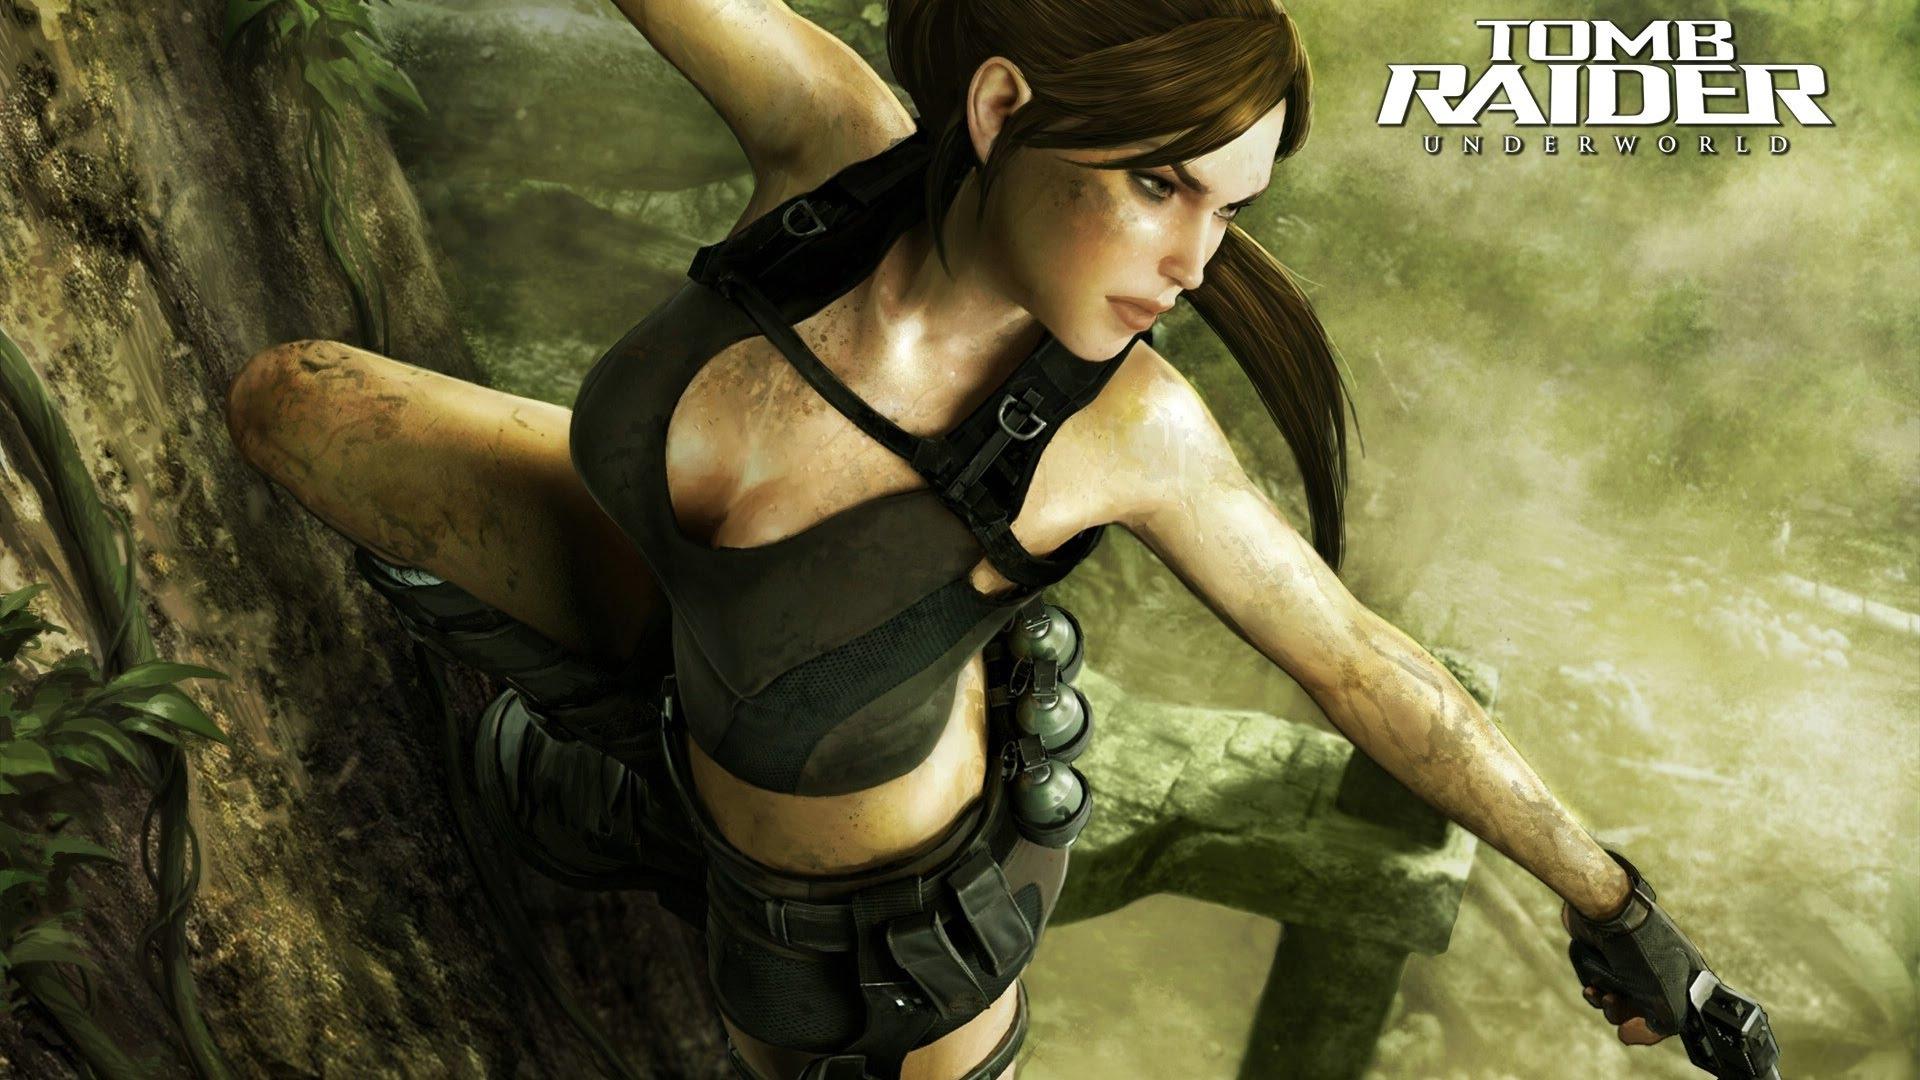 Tomb Raider Underworld Coming In Xmas 08 - ManaJournal com